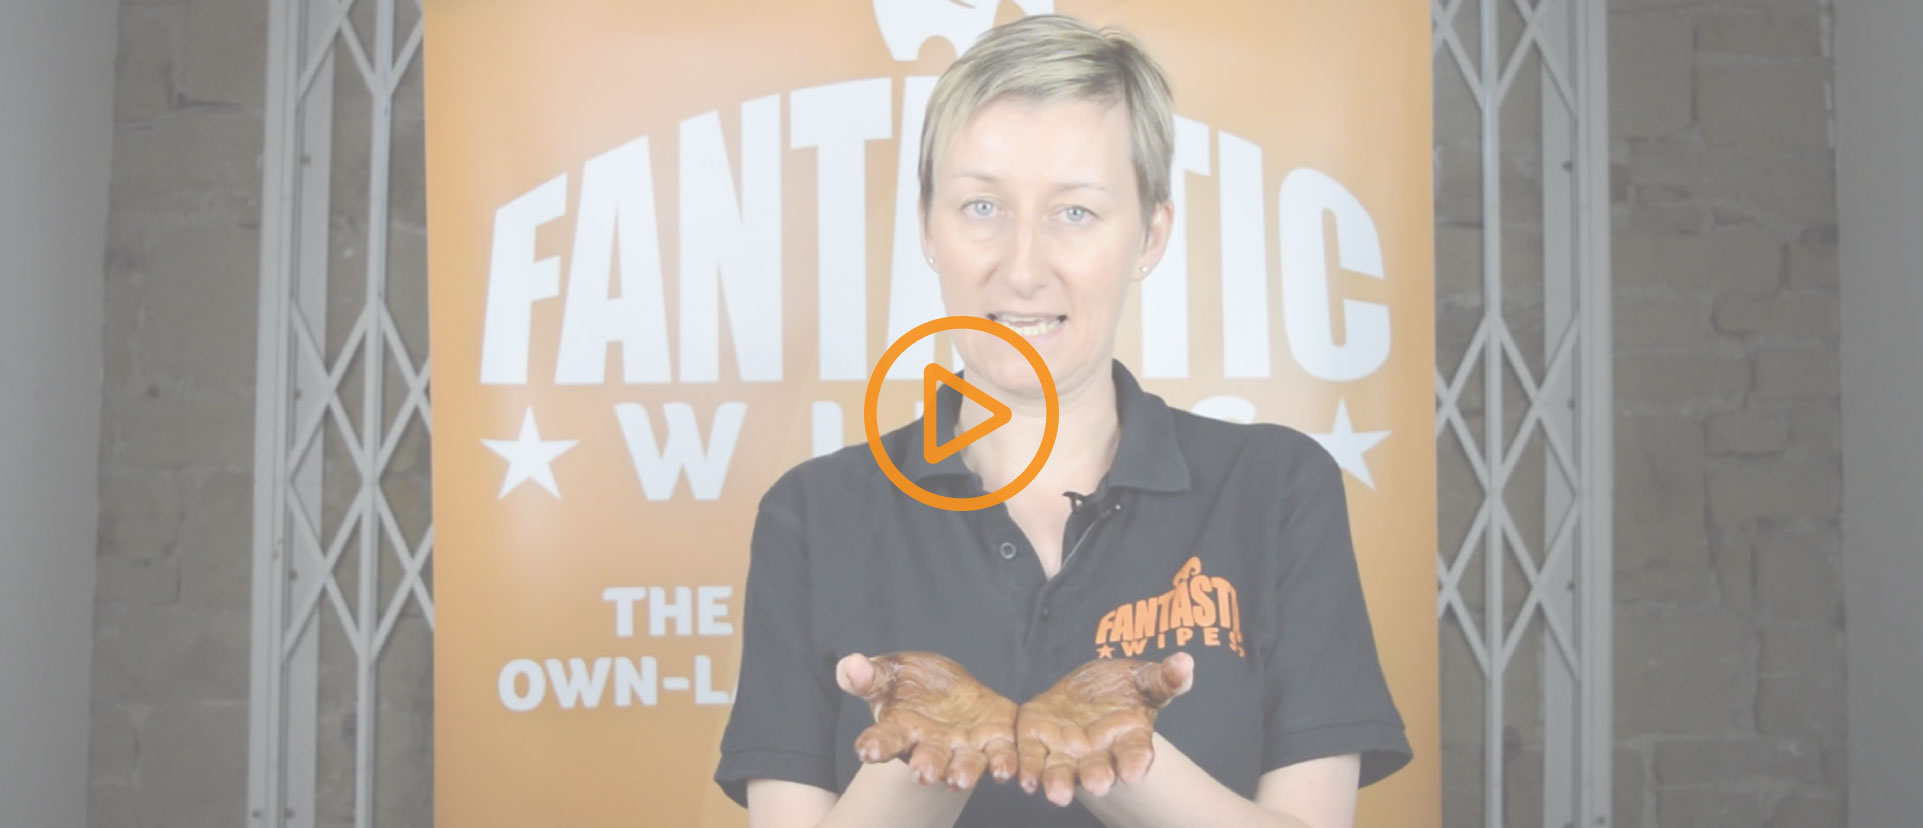 Wipe Demonstration Video Slider Banner with Orange Play Button